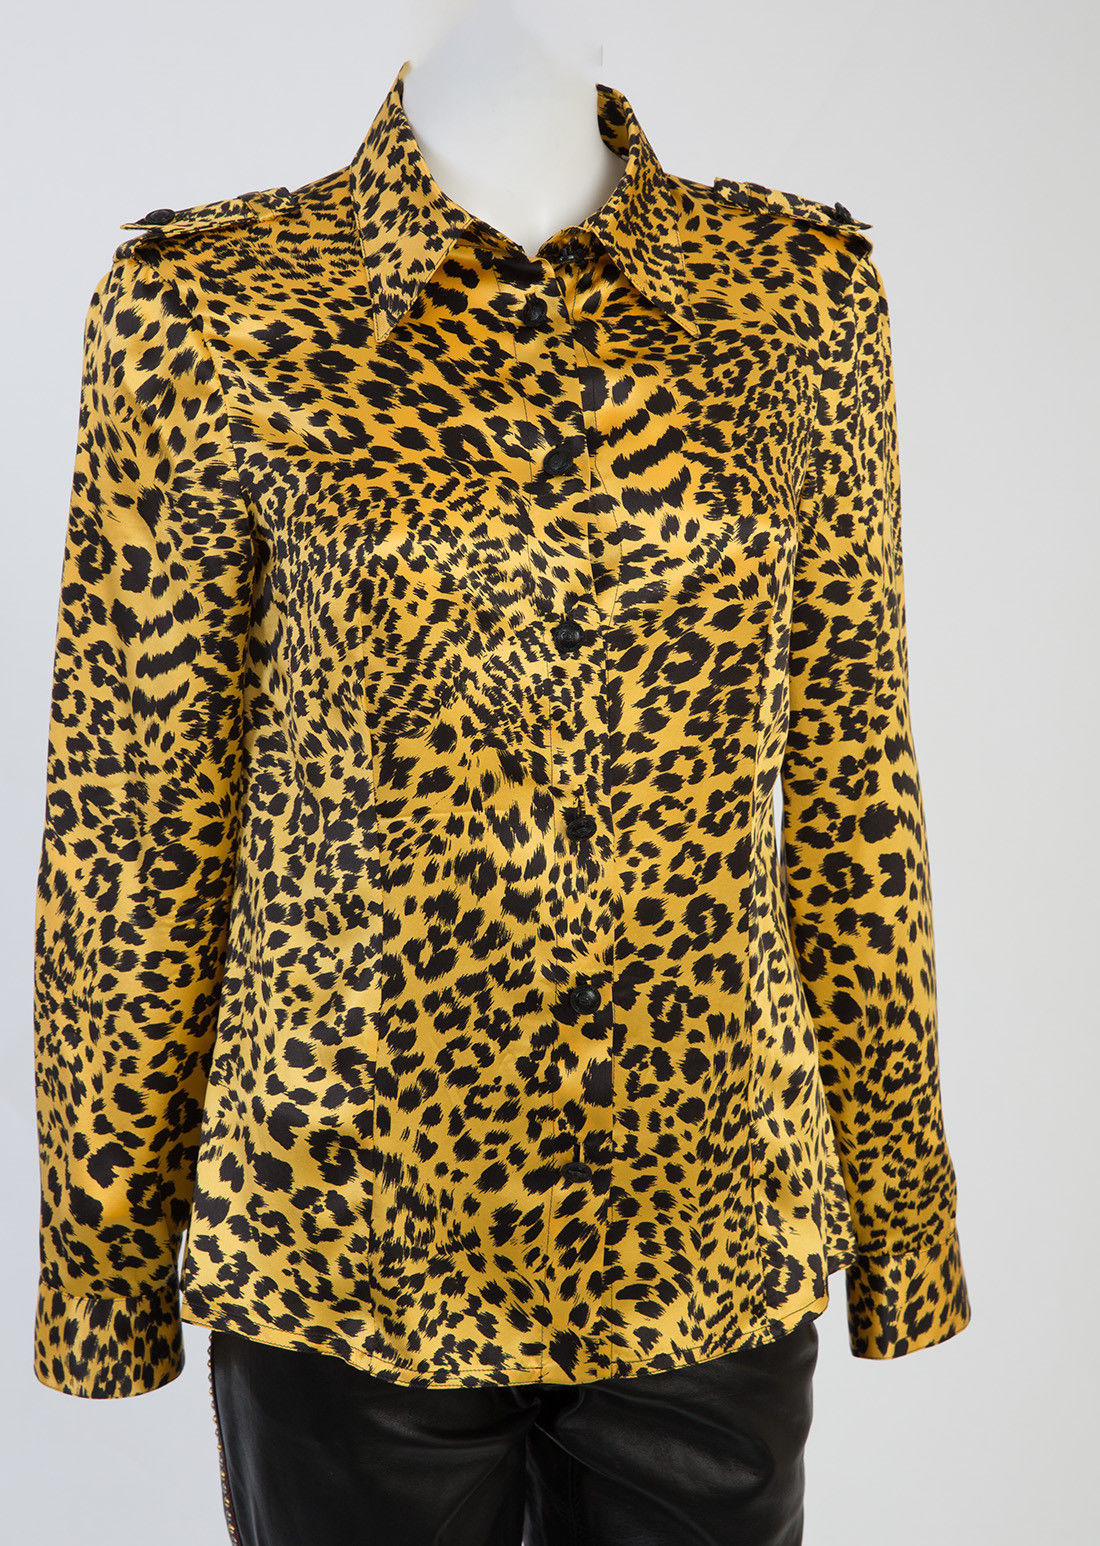 75bda400 Vintage Gianni Versace Shirts - 139 For Sale at 1stdibs